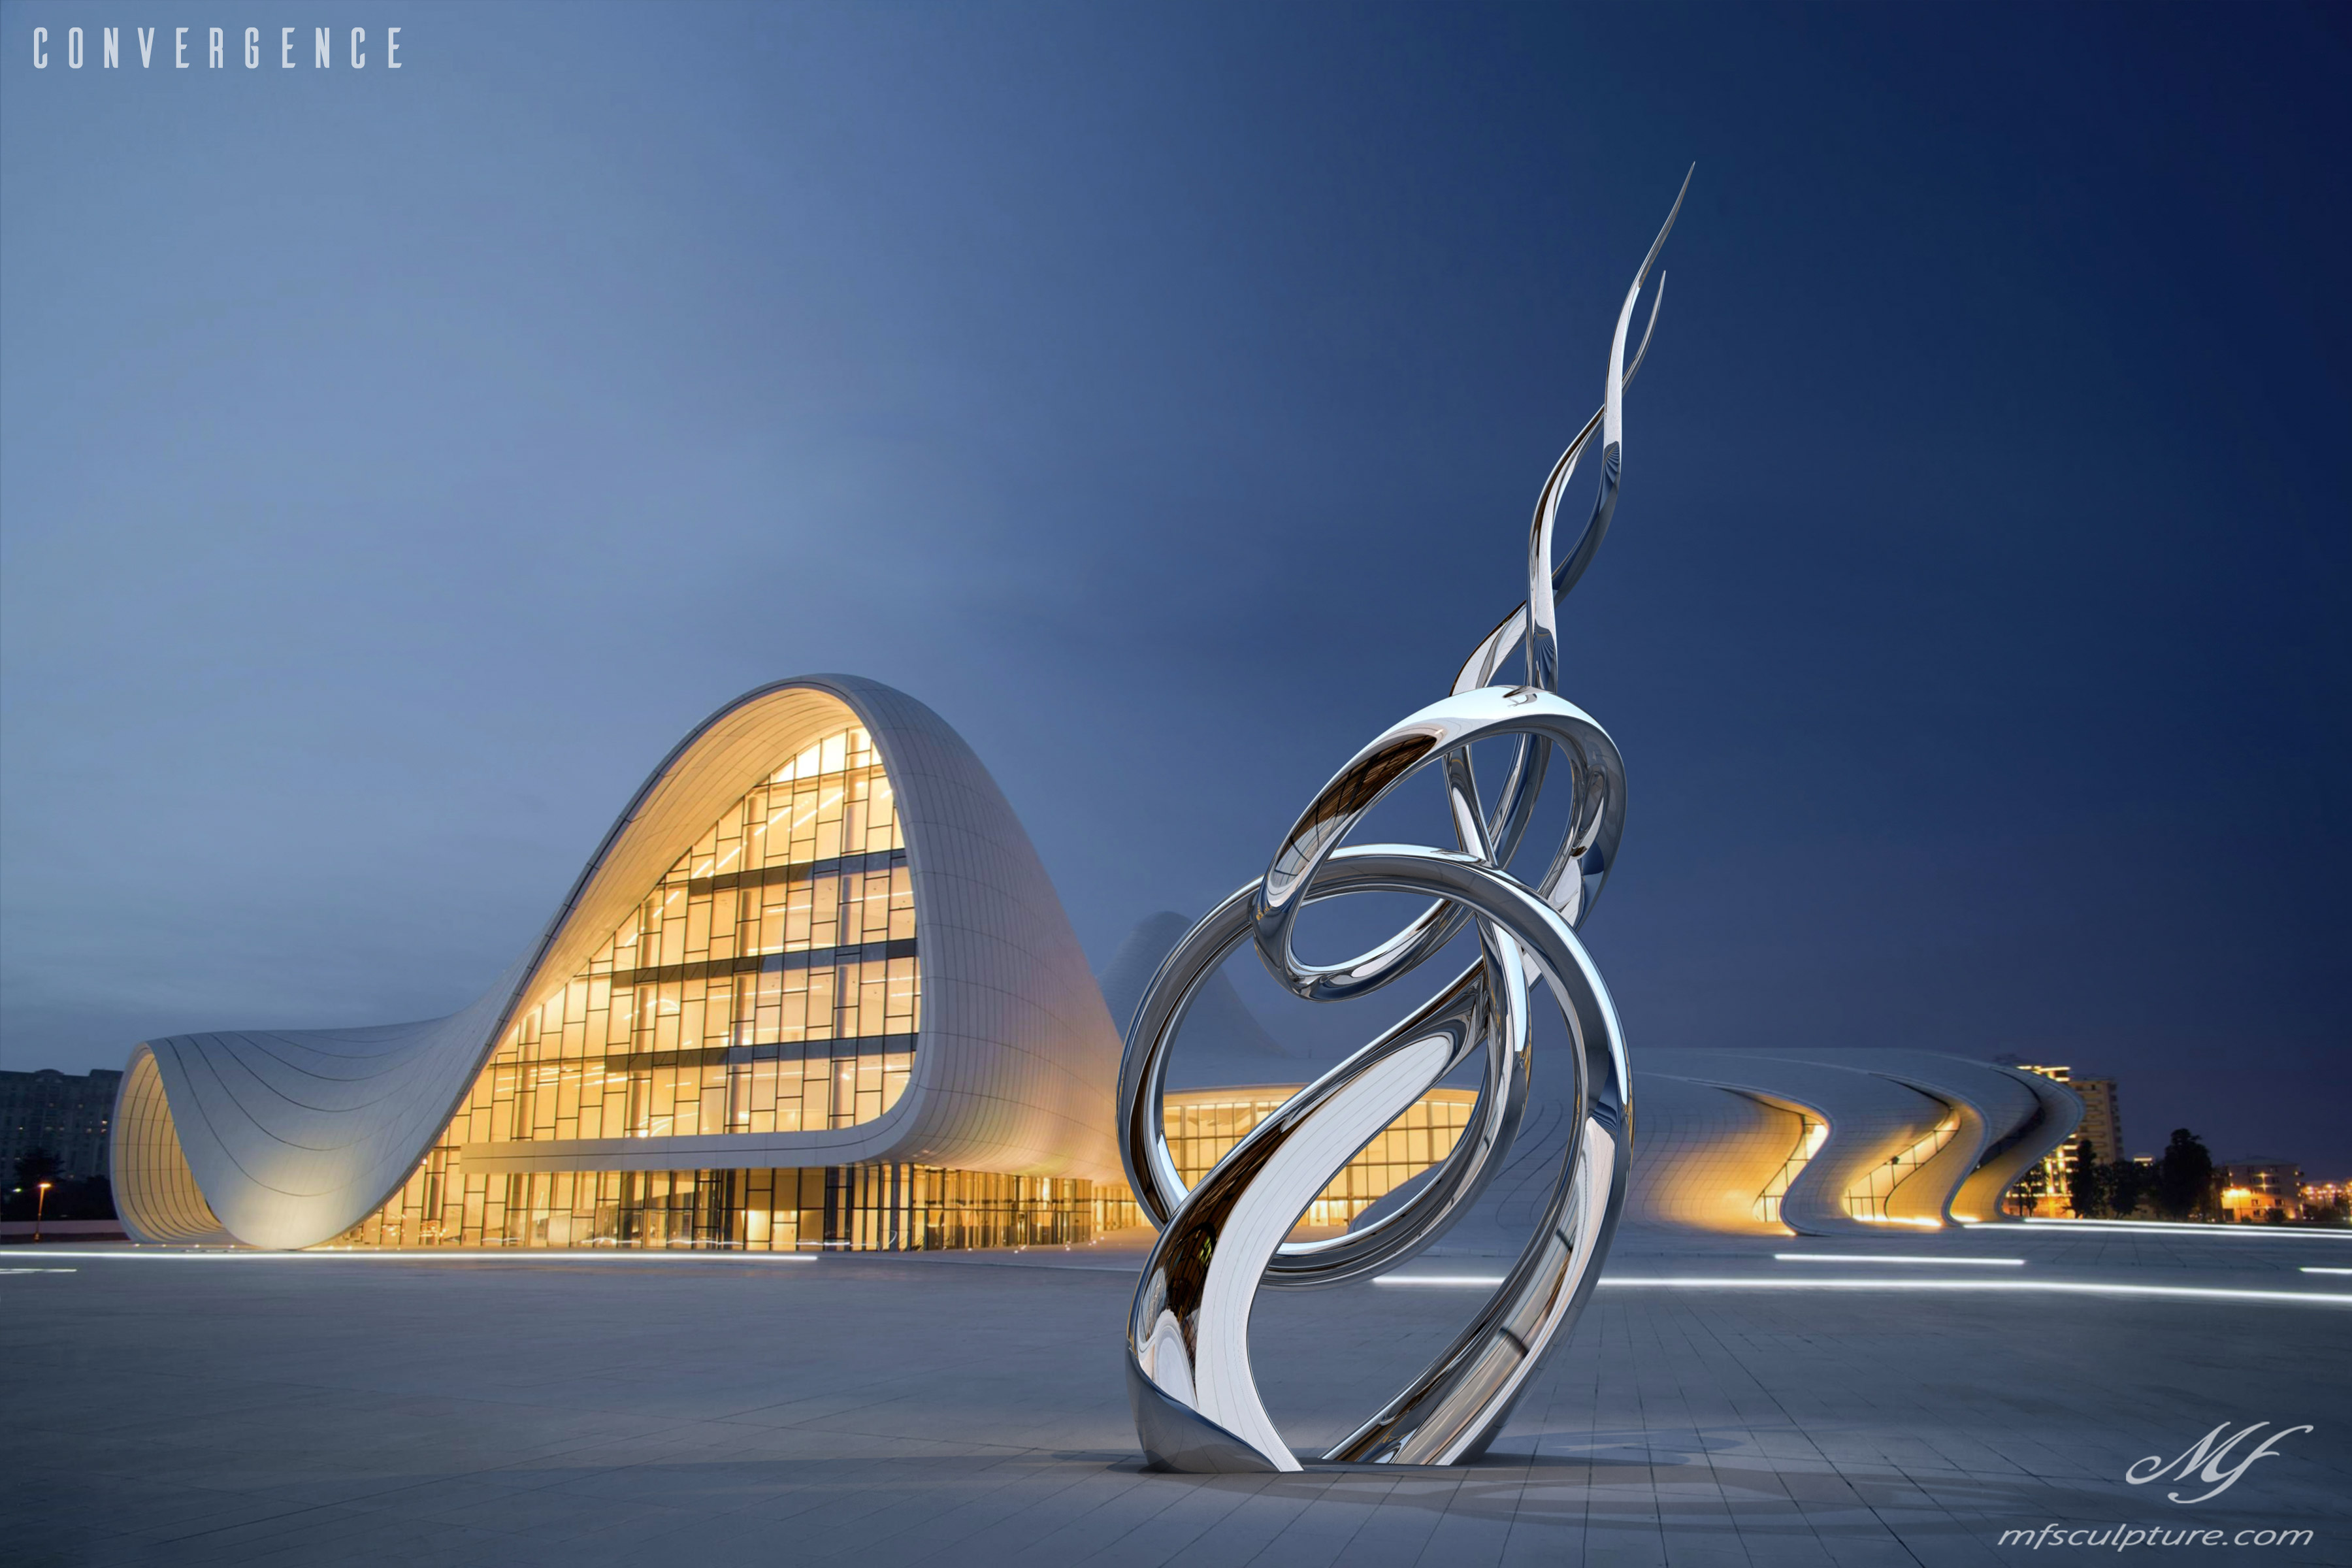 Heydar Aliyev Zaha Hadid Convergence Modern Sculpture Public Art 2